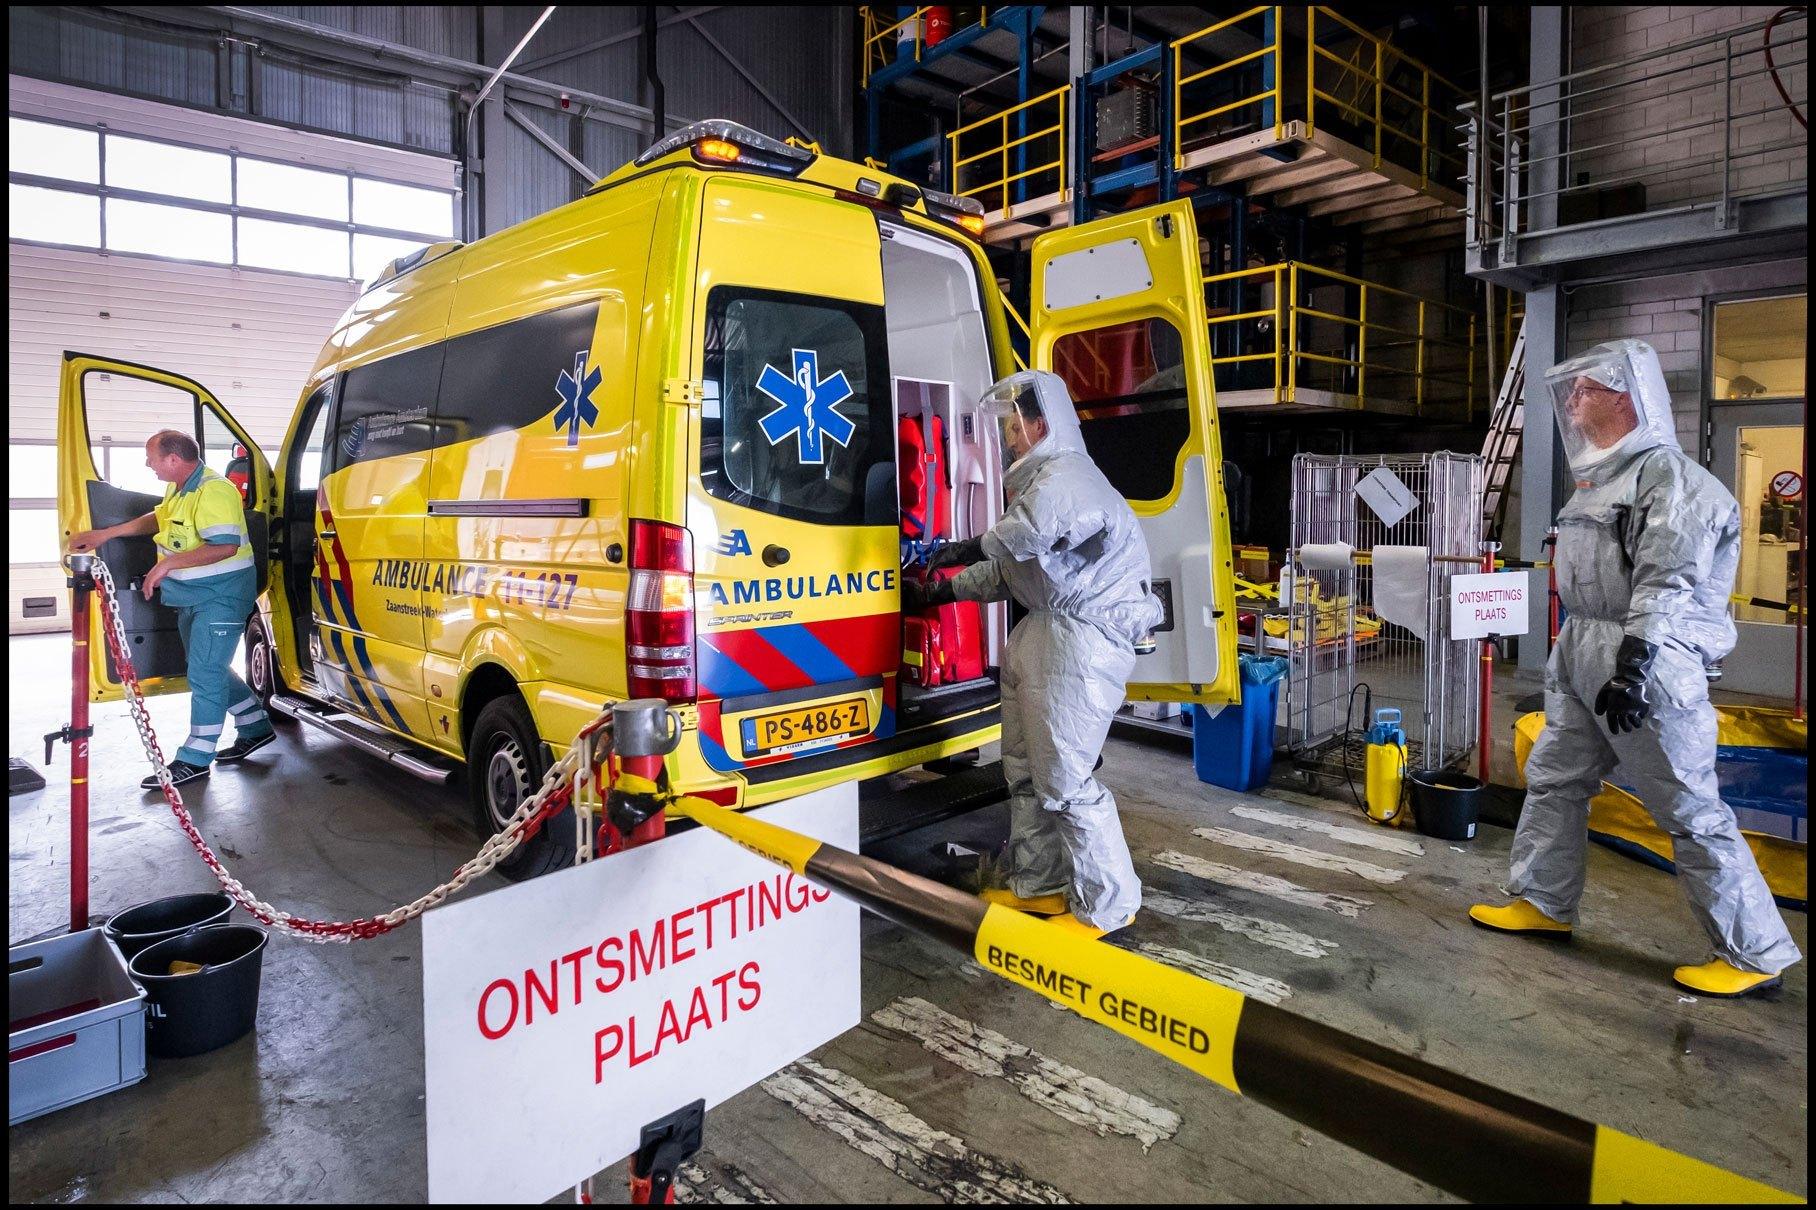 2-13960-NN-s-Ramon-van-Flymen-De-ambulance-wasstraat-in-Zaandam-002